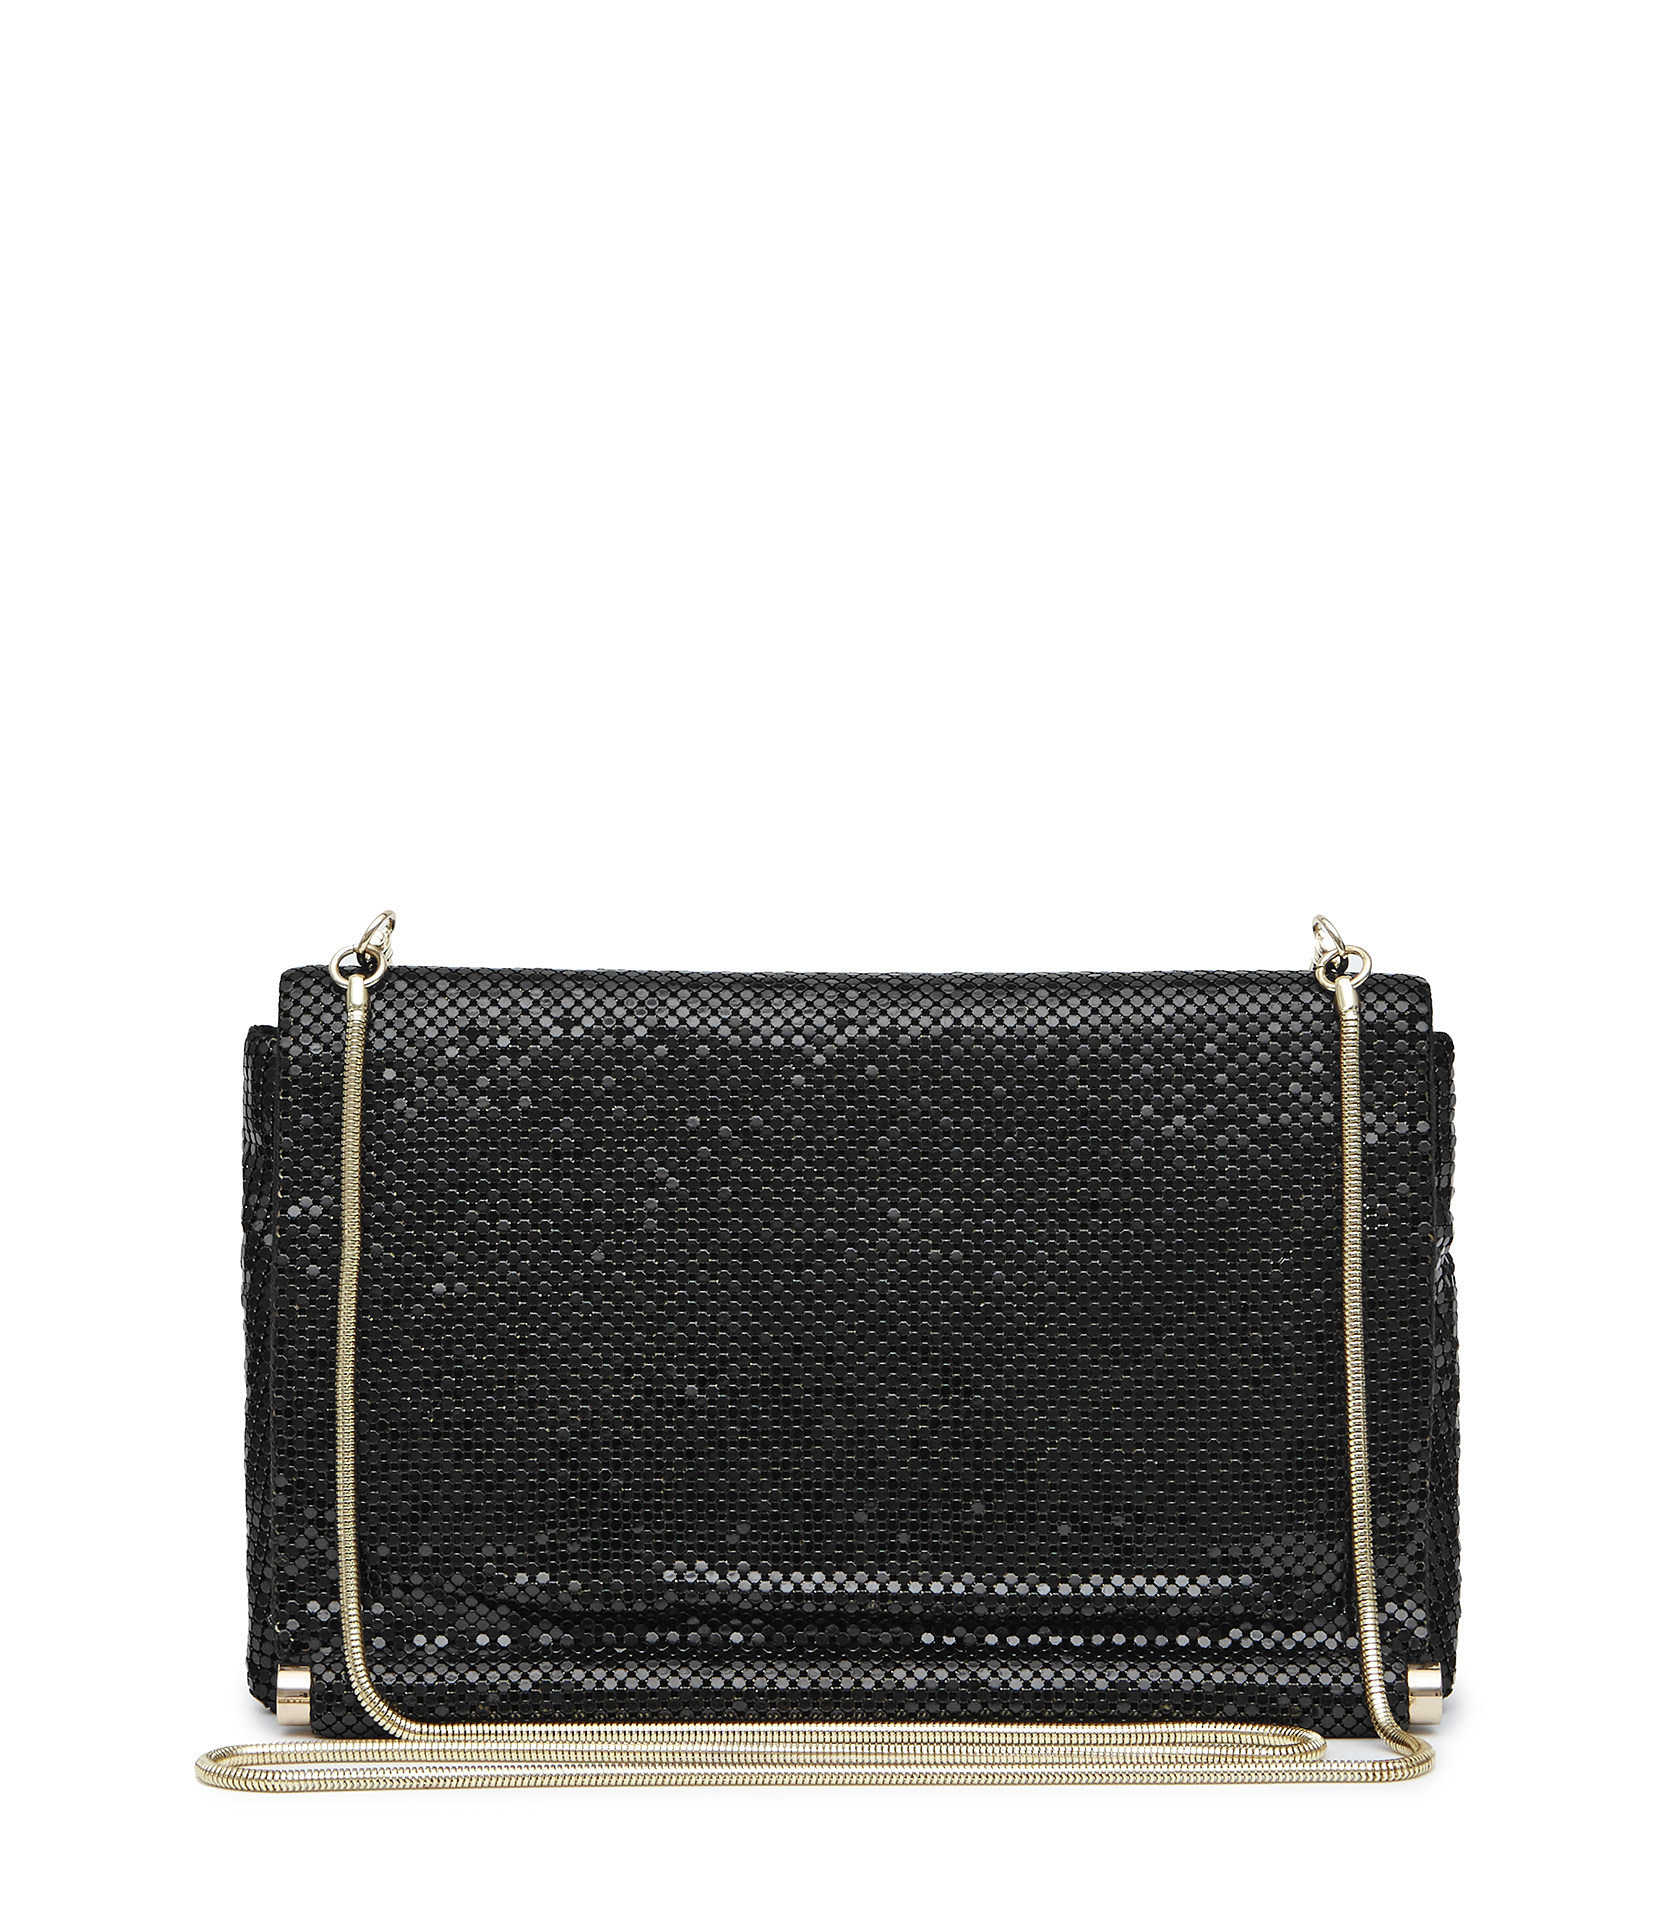 Rosa chainmail shoulder bag